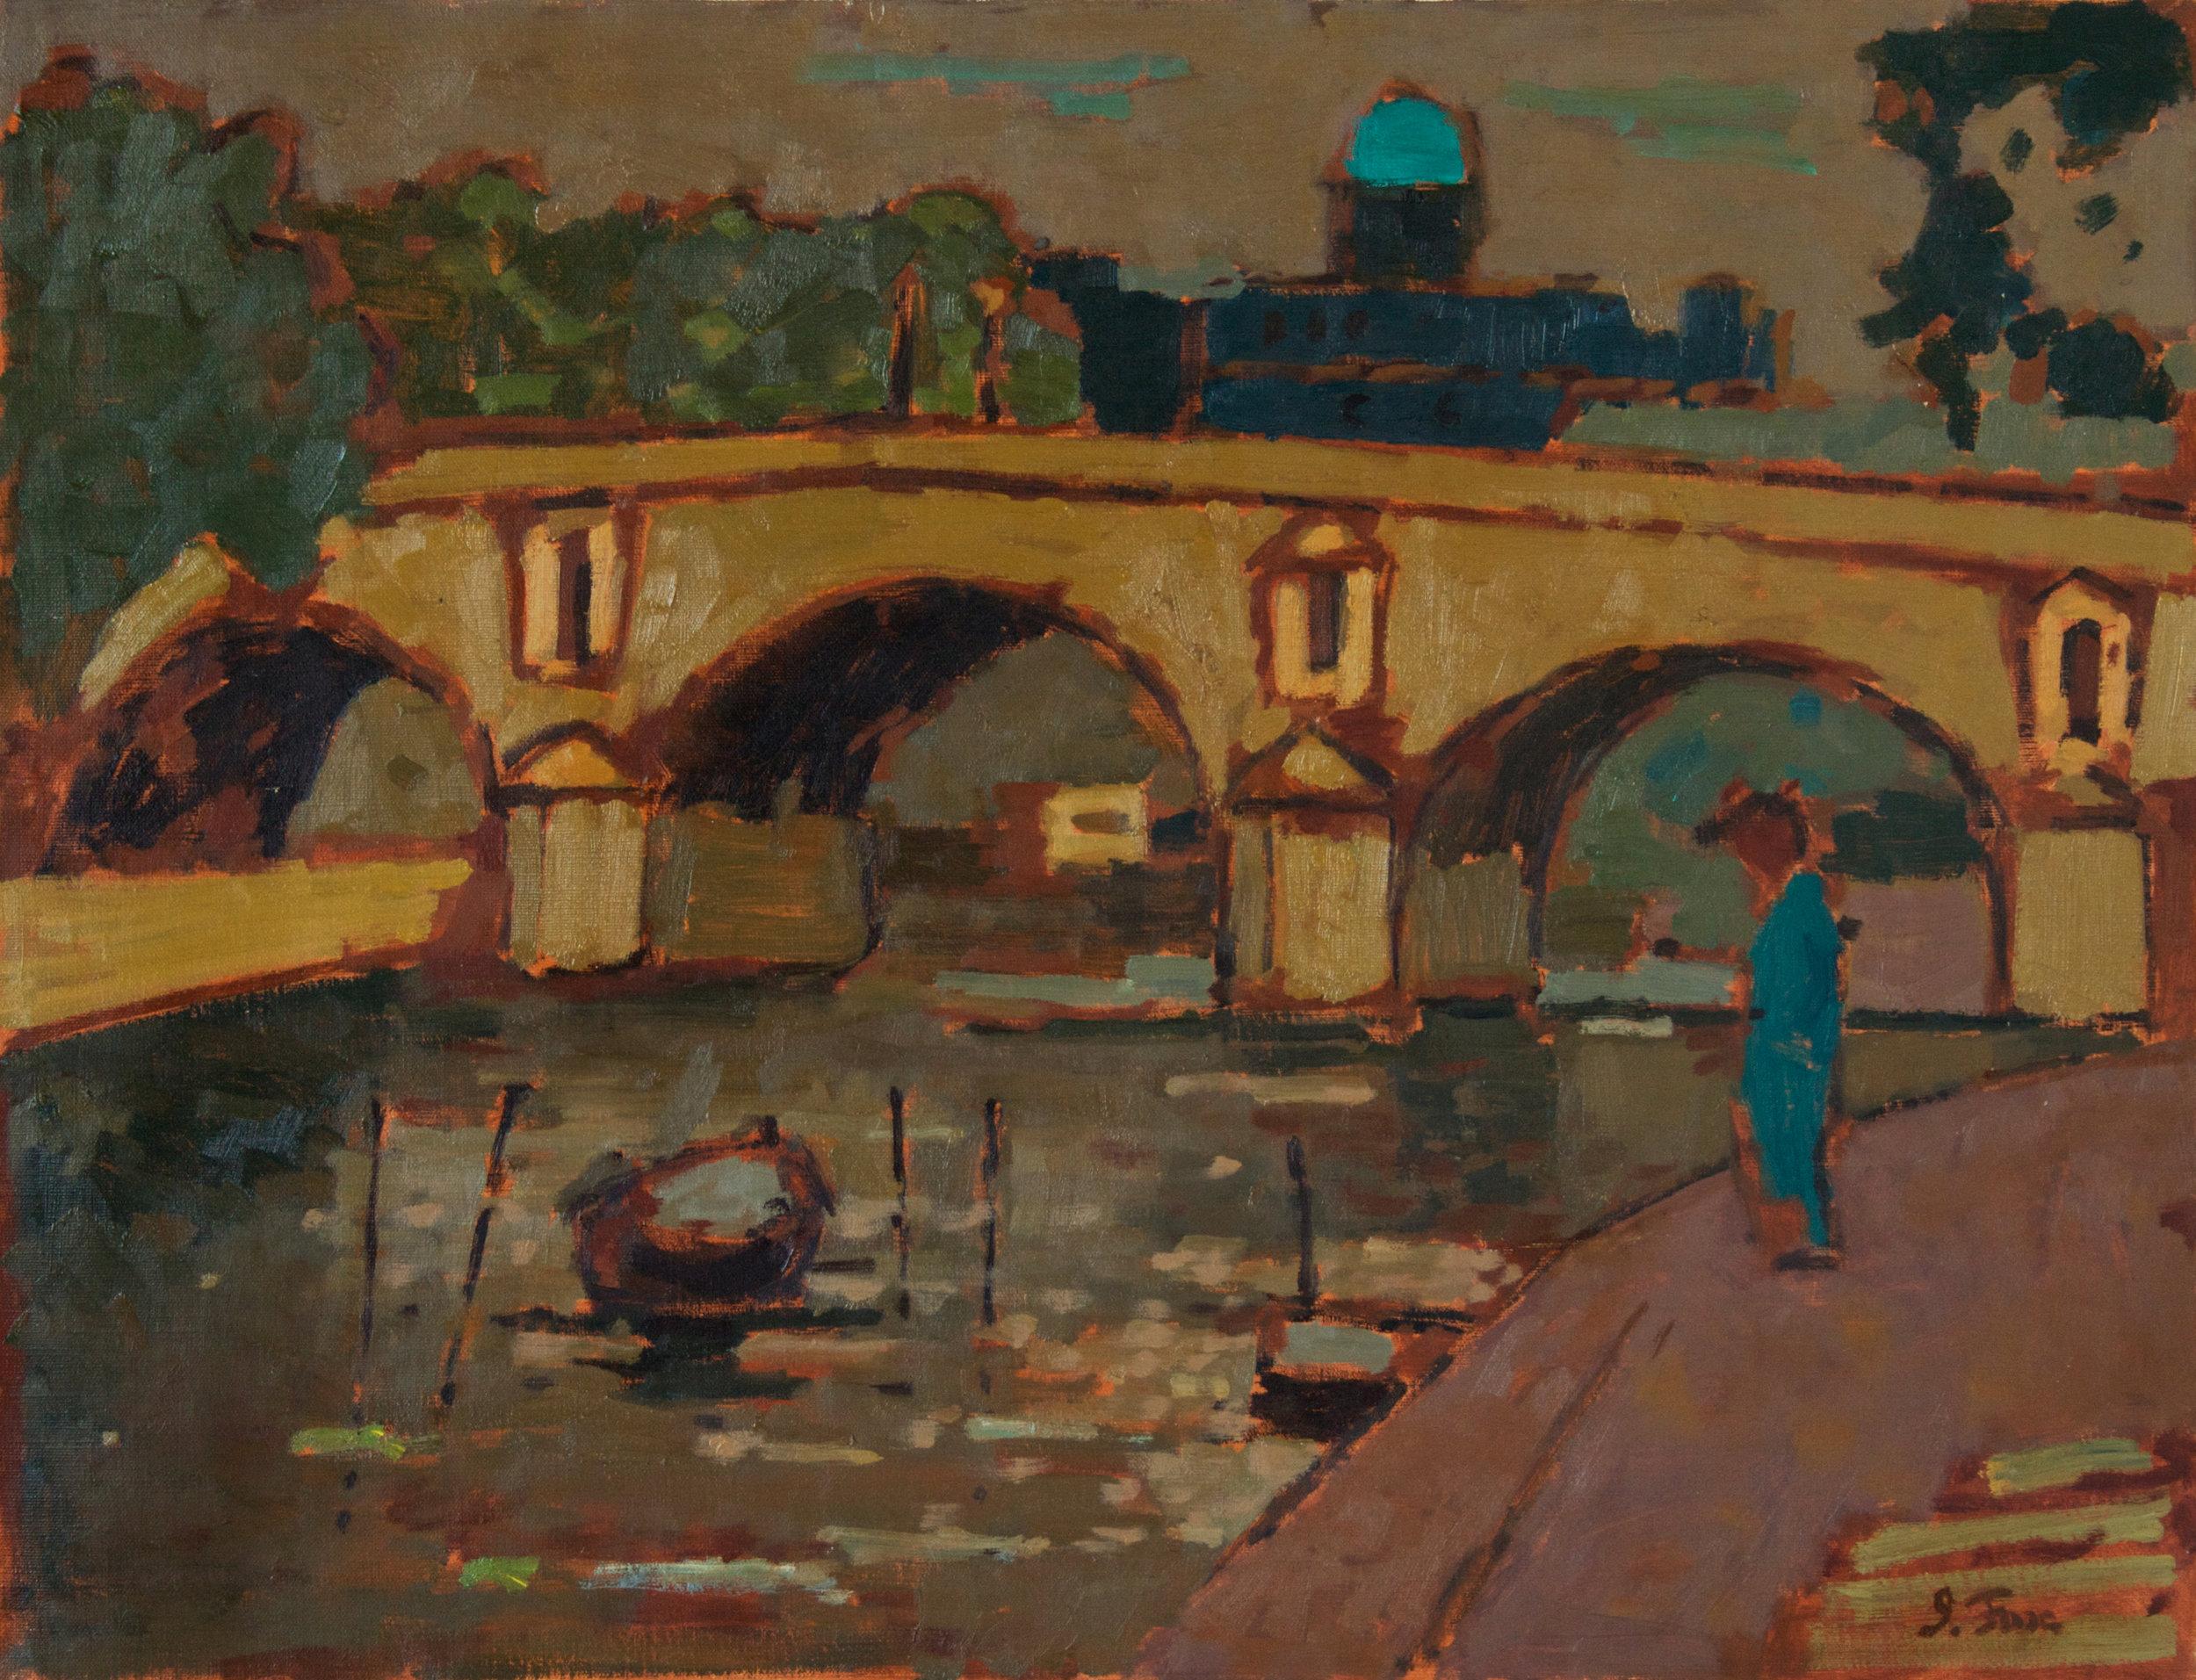 1956_Paris_Bridge_with_Figure_oil_on_linen_20x26in_PF300.jpg